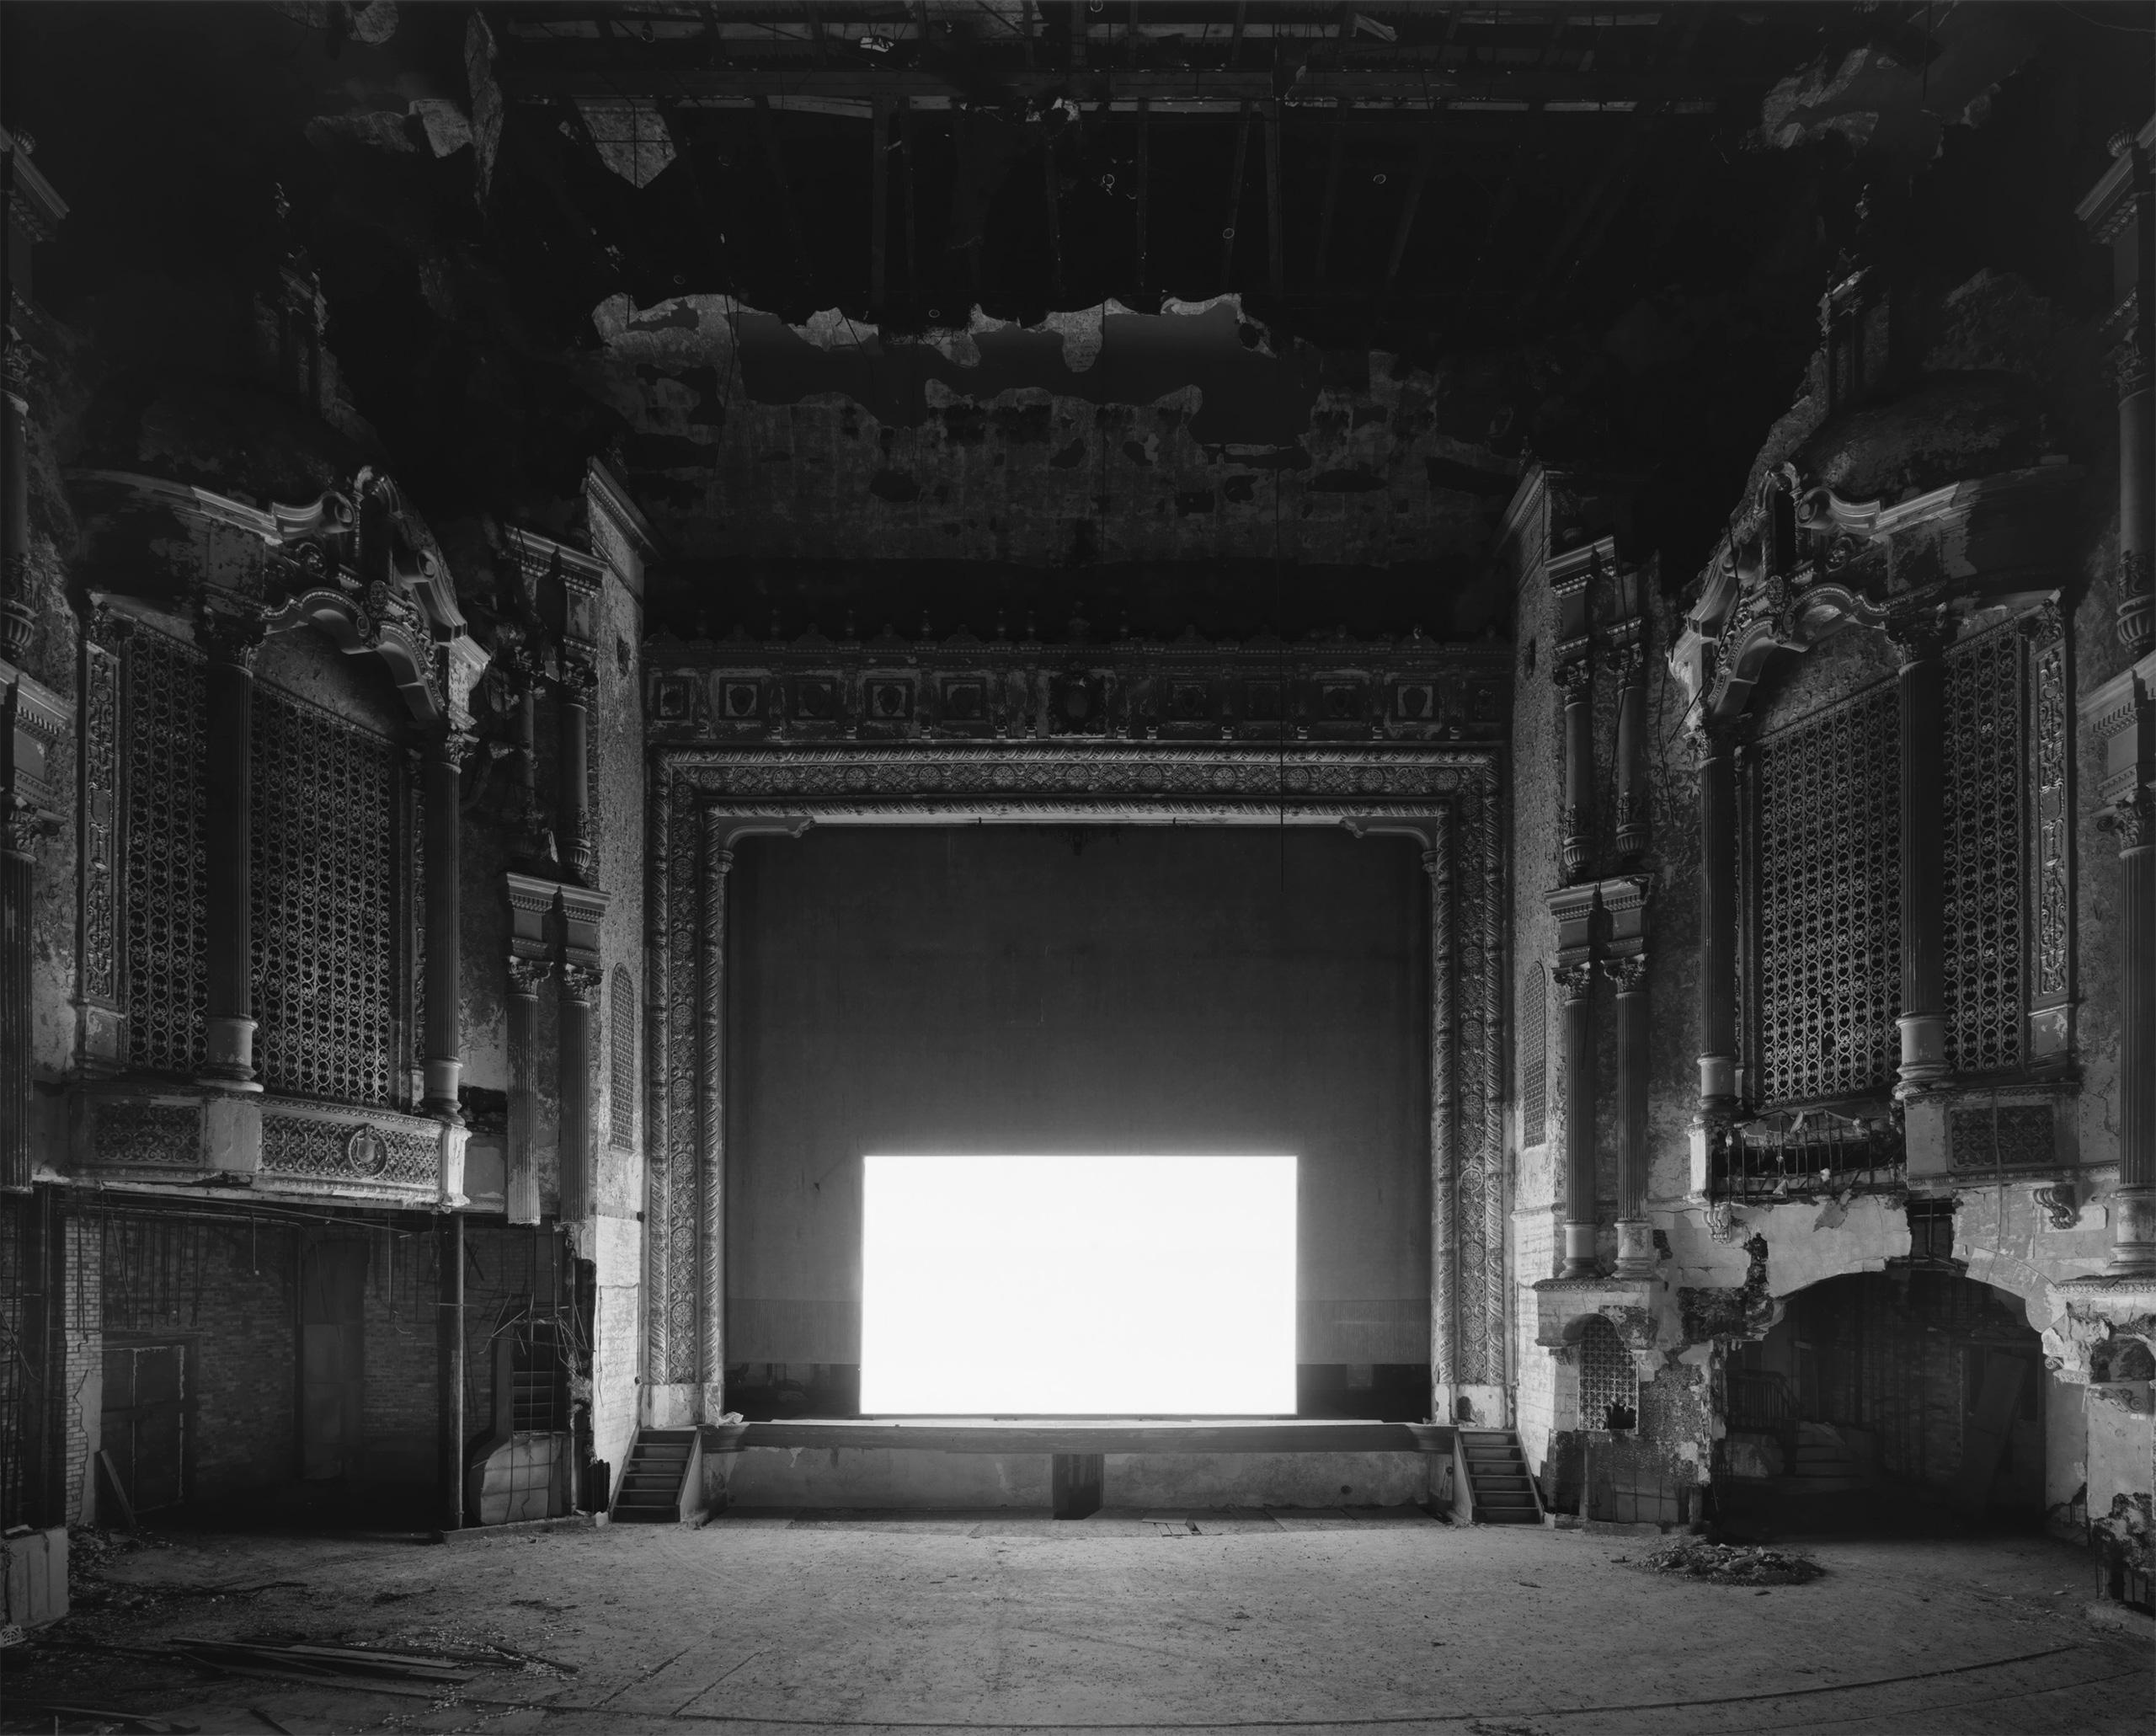 Kenosha Theater, Kenosha, 2015